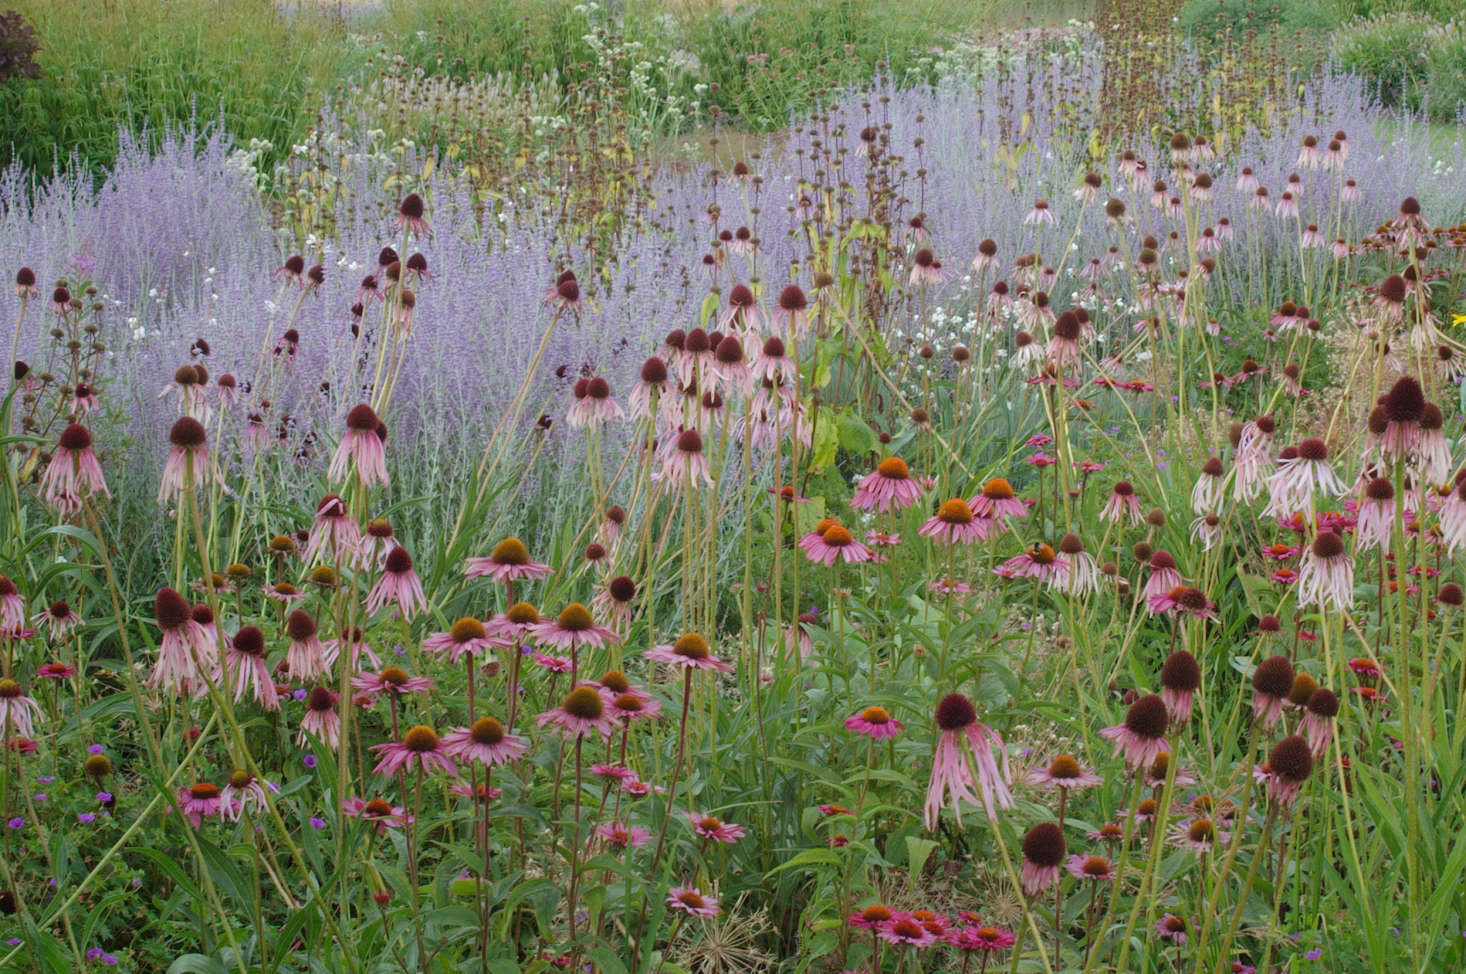 Echinacea varietiesand hazy purple Perovskia atriplicifolia (Russian sage)mingle in Dutch designer Piet Oudolf&#8